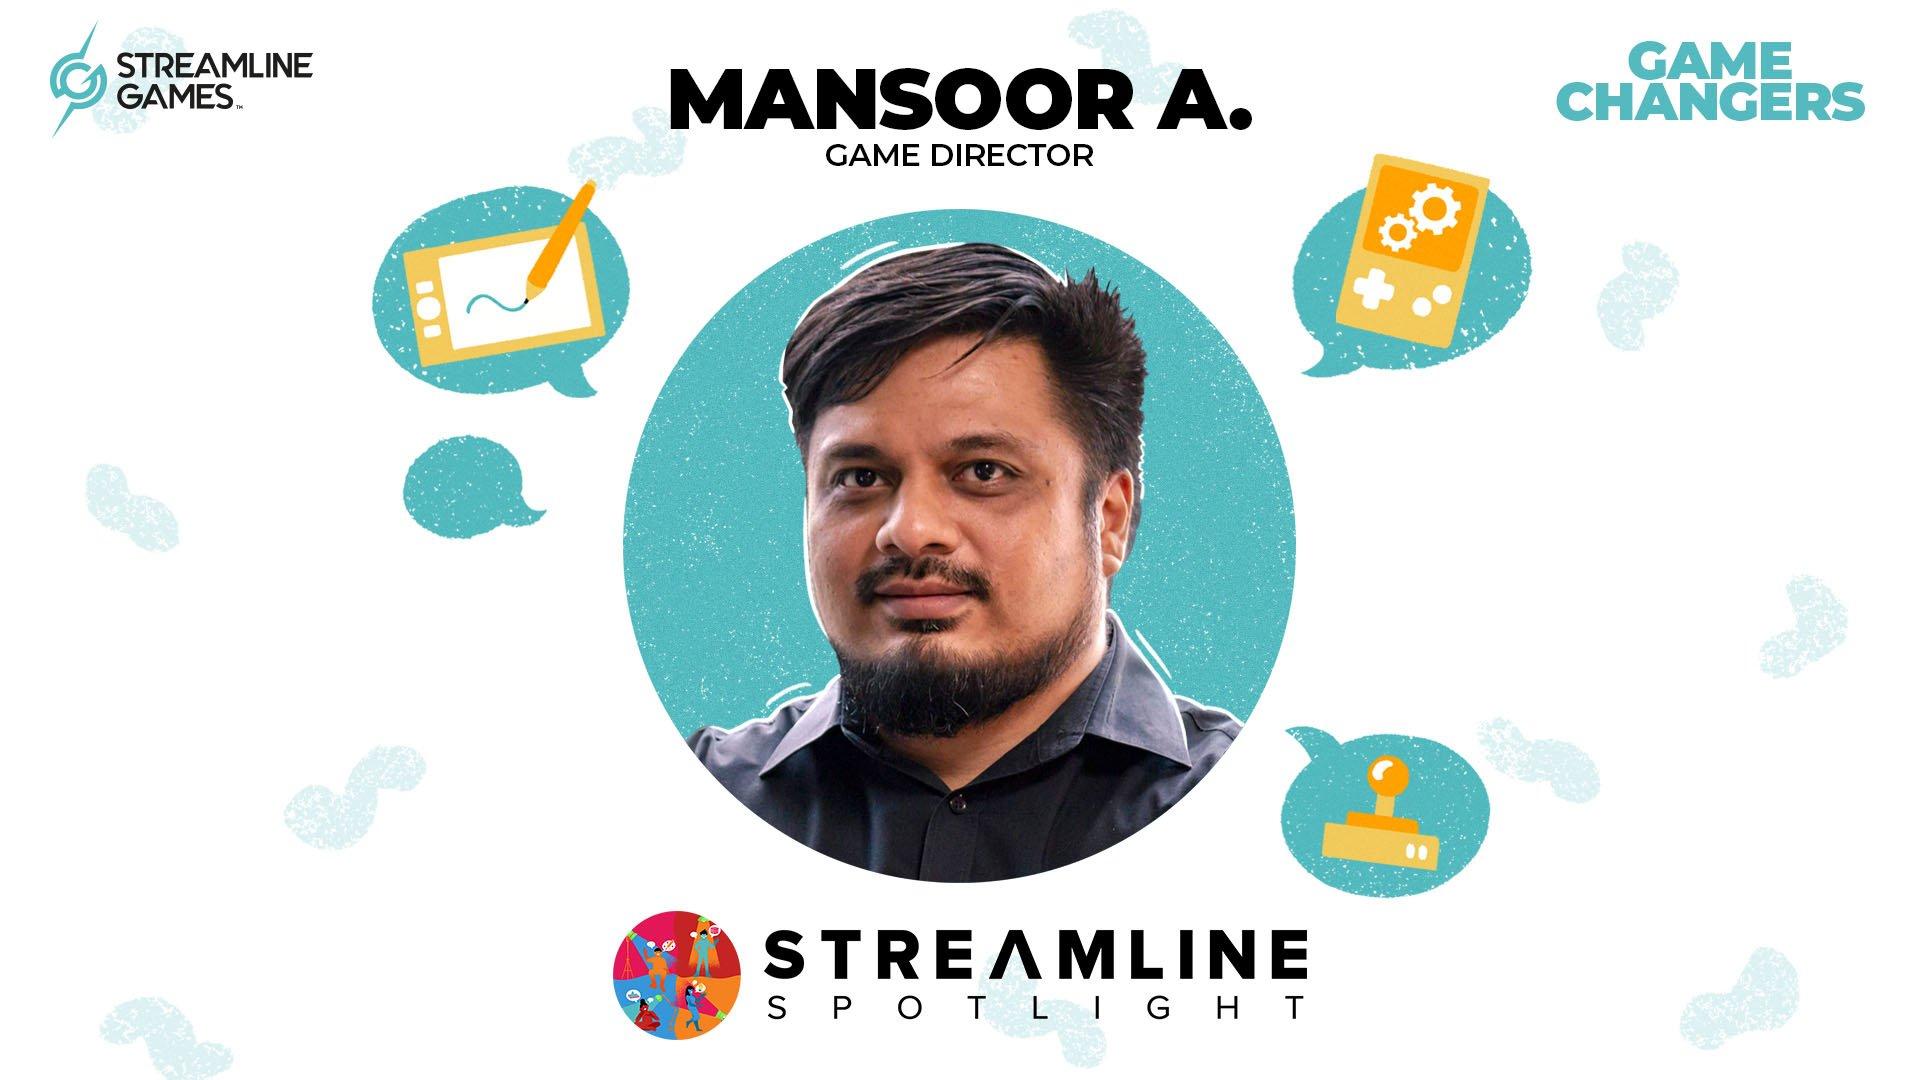 Streamline Spotlight Streamline Games Mansoor Anwar